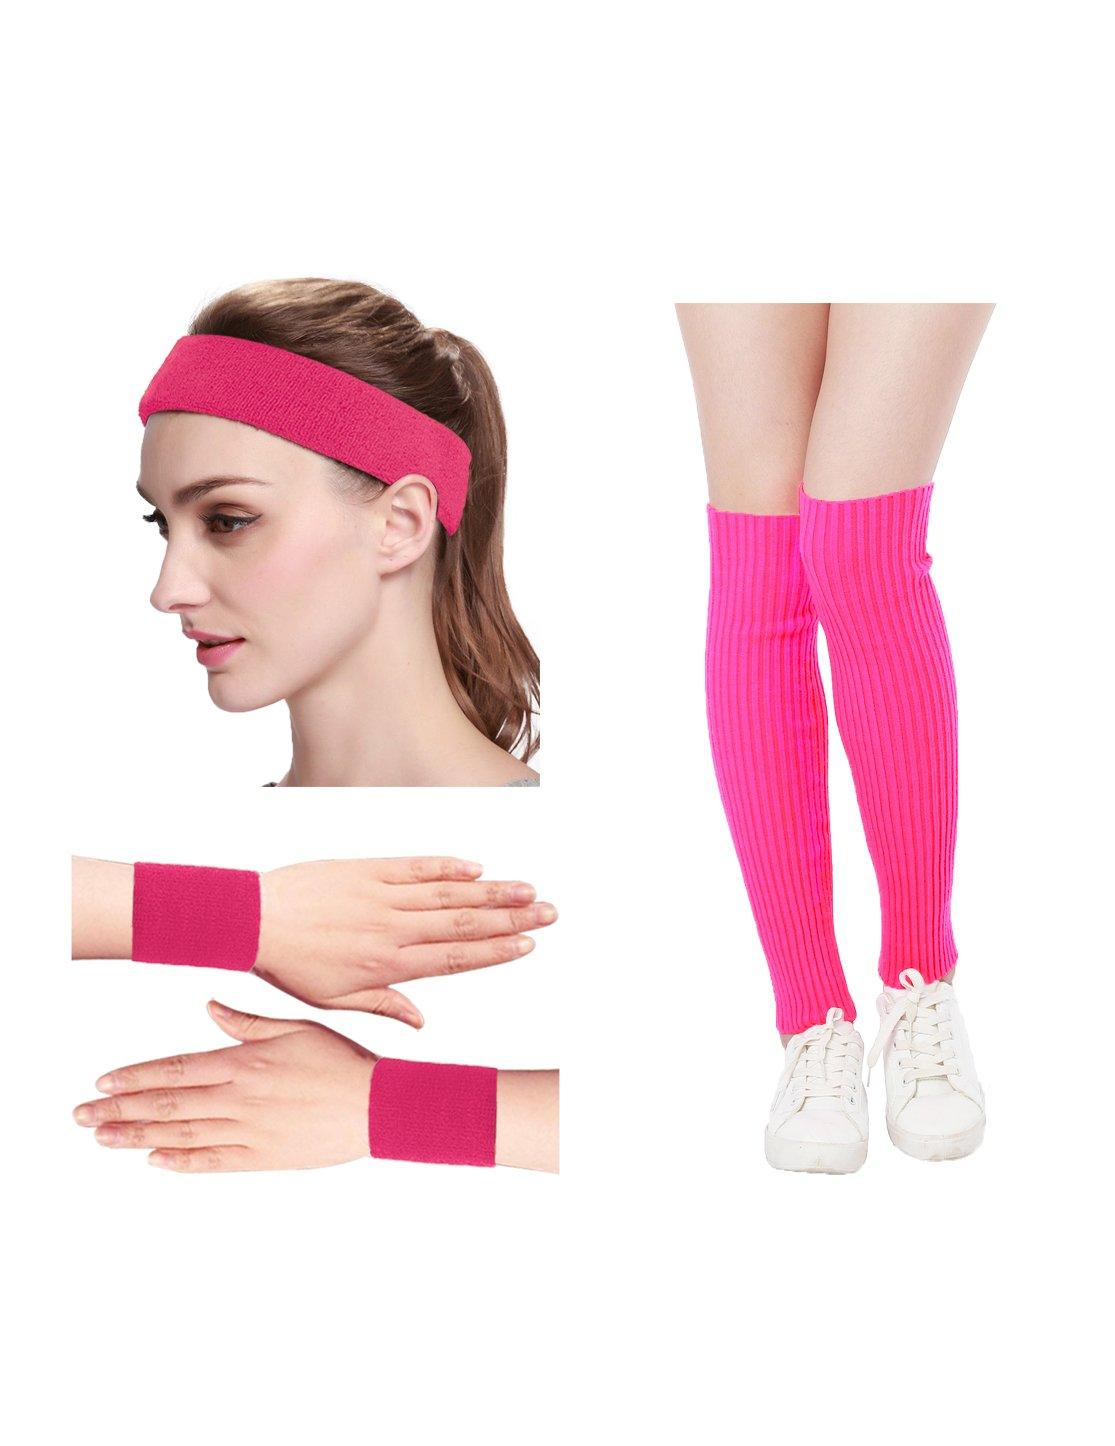 KIMBERLY S KNIT Women 80s Neon Pink Running Headband Wristbands Leg Warmers Set (Free, HotPink)